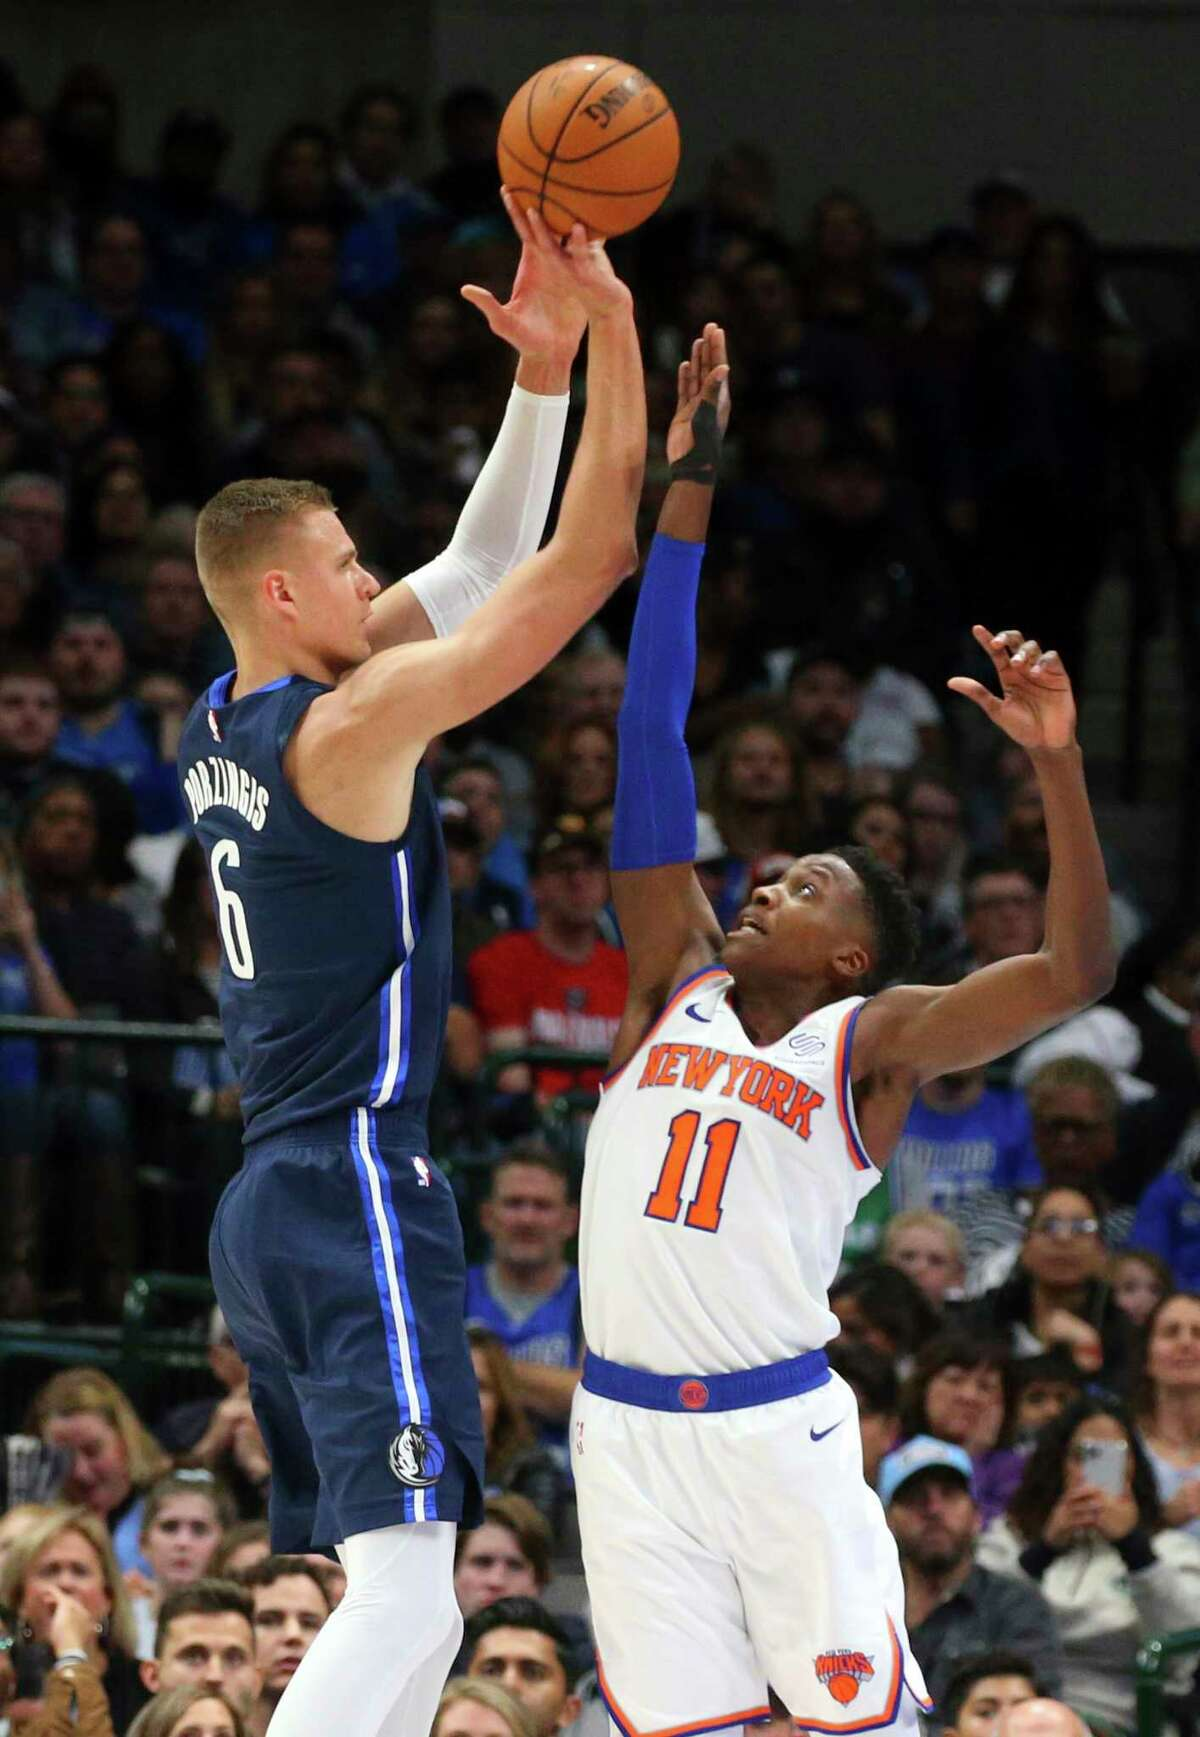 Dallas Mavericks forward Kristaps Porzingis (6) puts up a shot over New York Knicks guard Frank Ntilikina (11) in the first half of an NBA basketball game Friday, Nov. 8, 2019, in Dallas. (AP Photo/Richard W. Rodriguez)